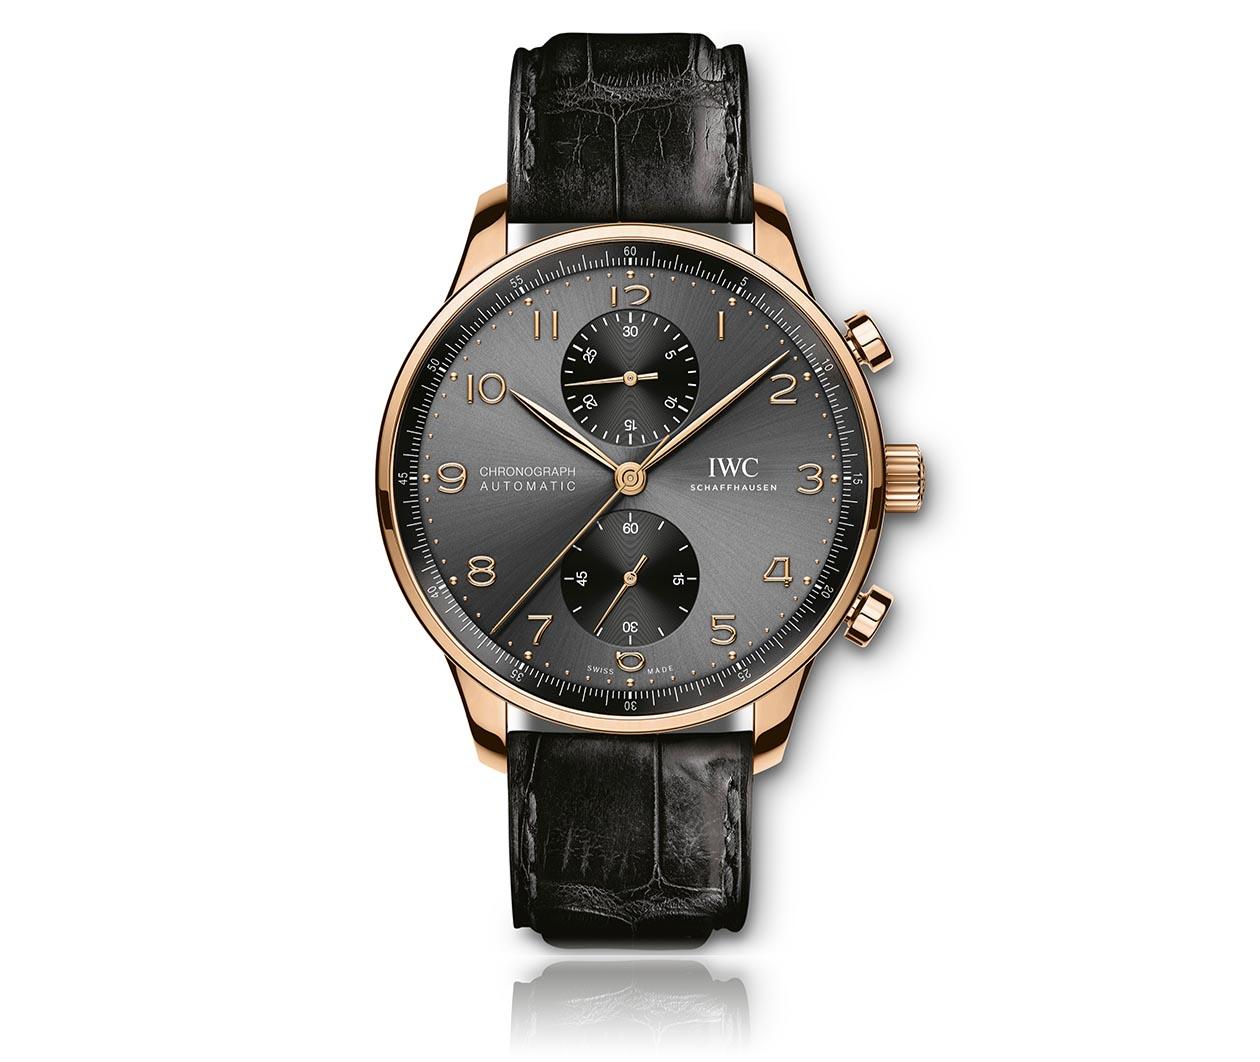 IWC Portugieser Chronograph IW371610 Carousel 1 FINAL